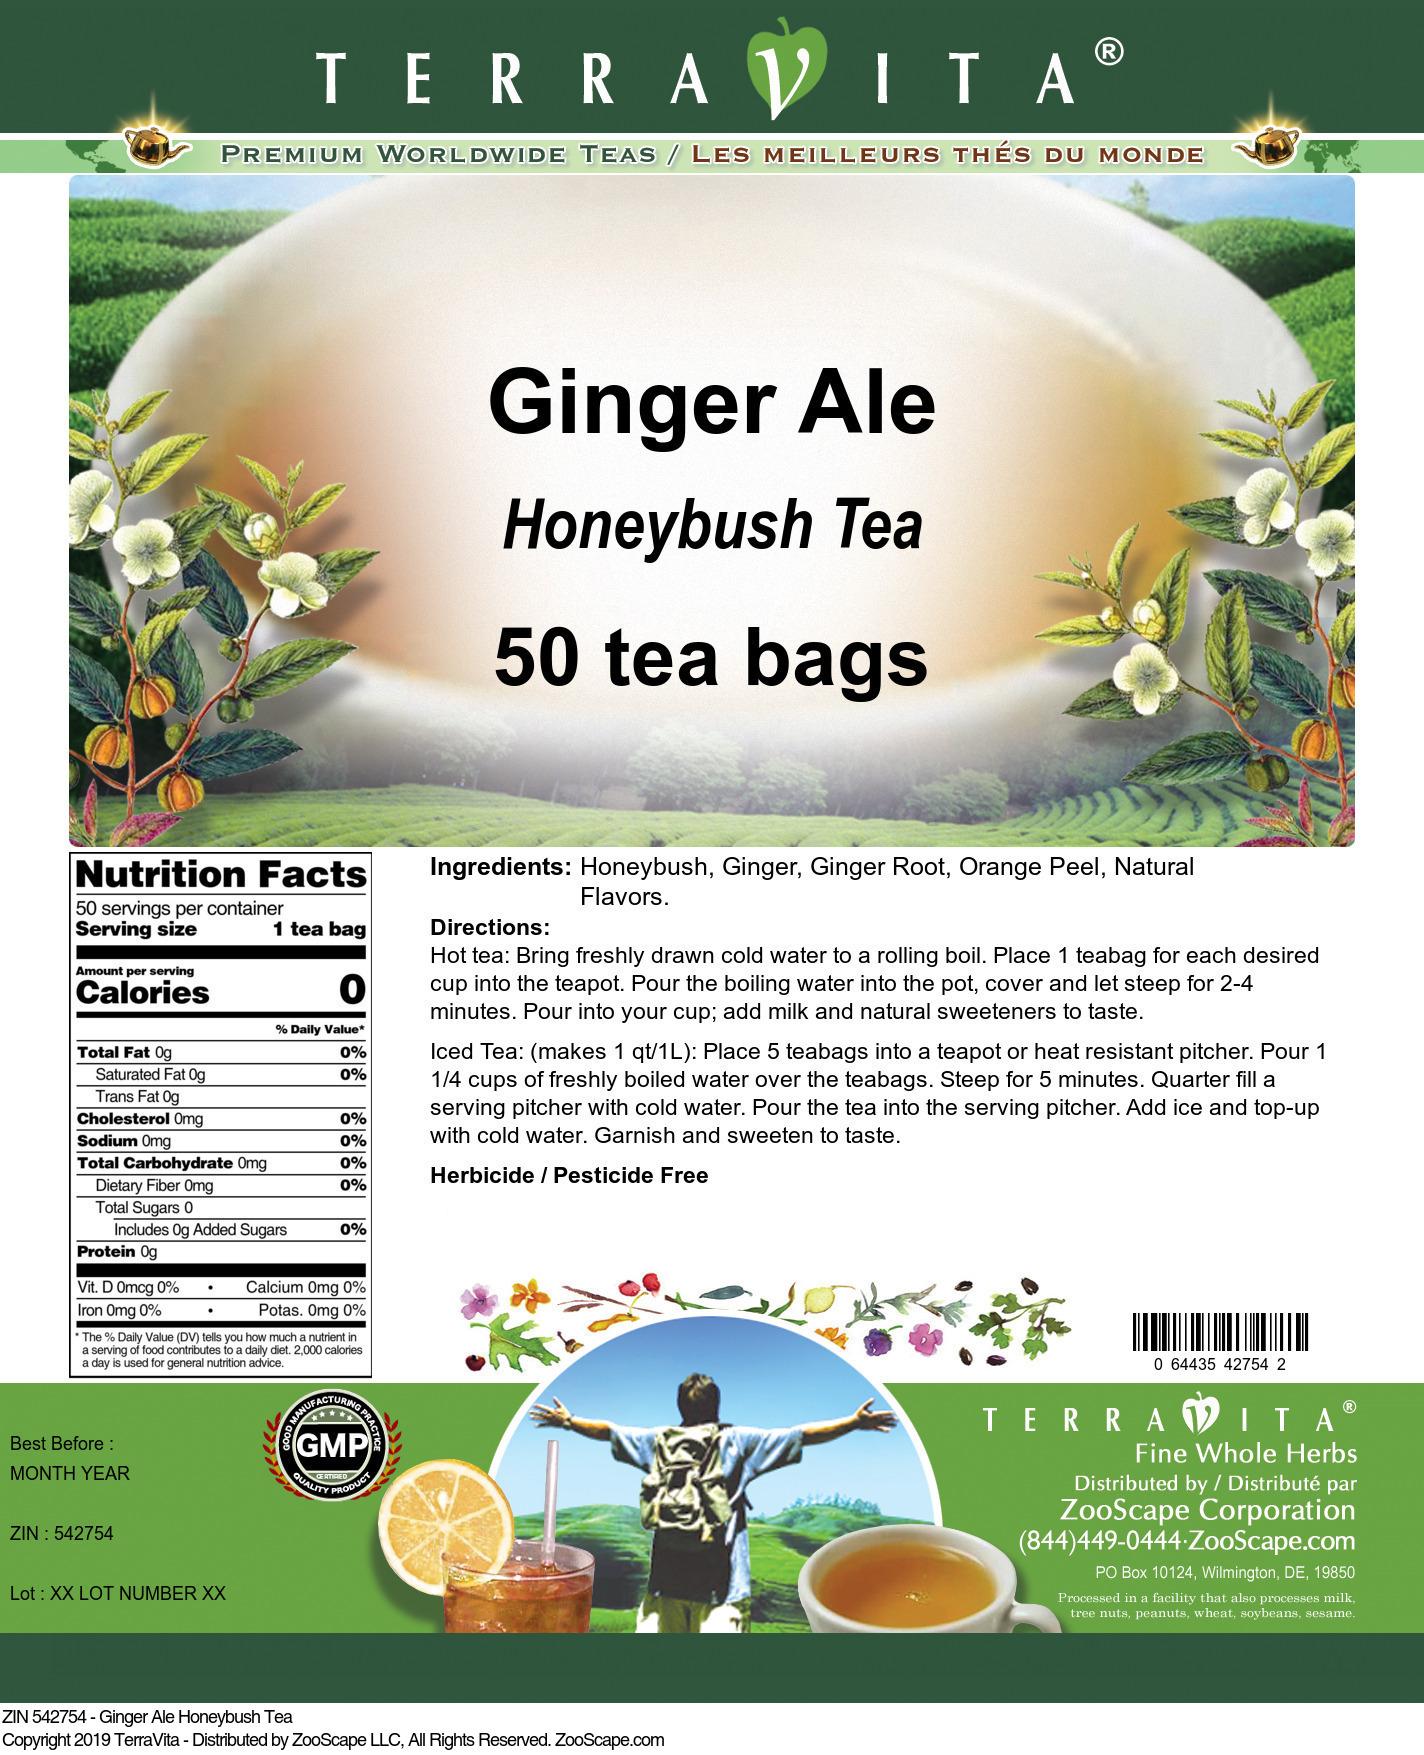 Ginger Ale Honeybush Tea